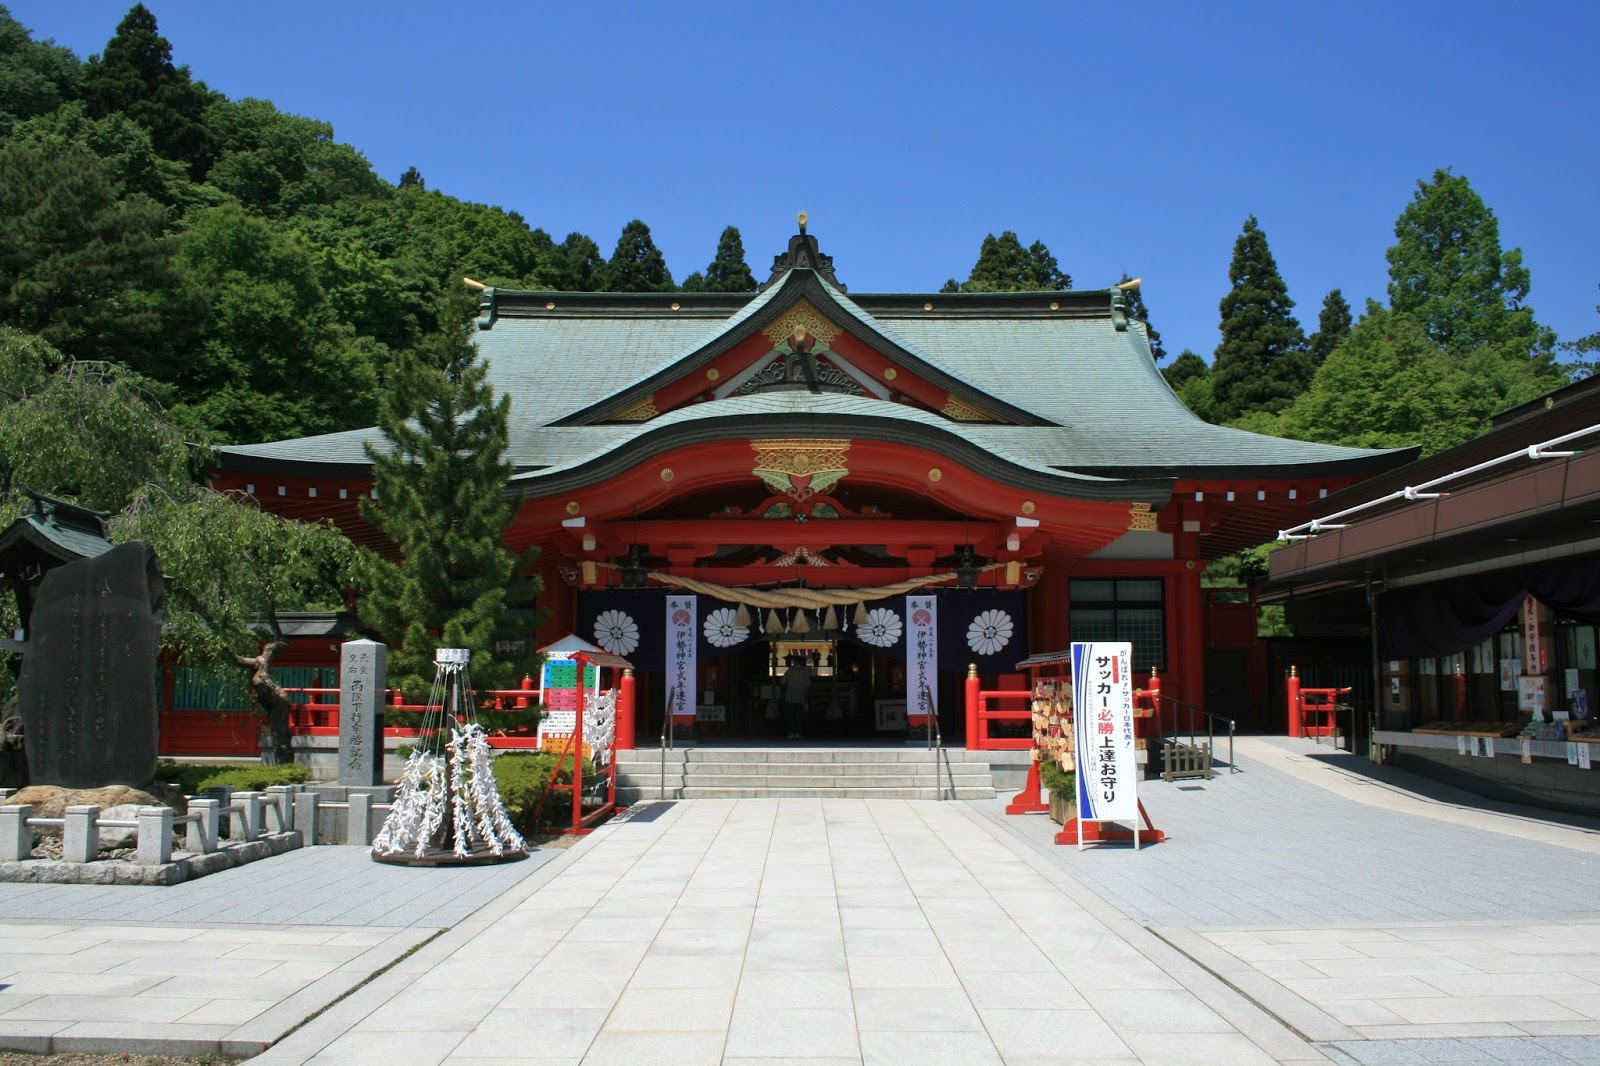 https://2.bp.blogspot.com/-akKR2ncd1AI/V5guHUhAc-I/AAAAAAAJFUY/3ZcqJbfv5PA5UEKeHX6QBkkdGF-FJpIuwCLcB/s1600/Miyagi_Prefecture_Gokoku_Shrine_Hall_of_Worship_2010-06-03.JPG